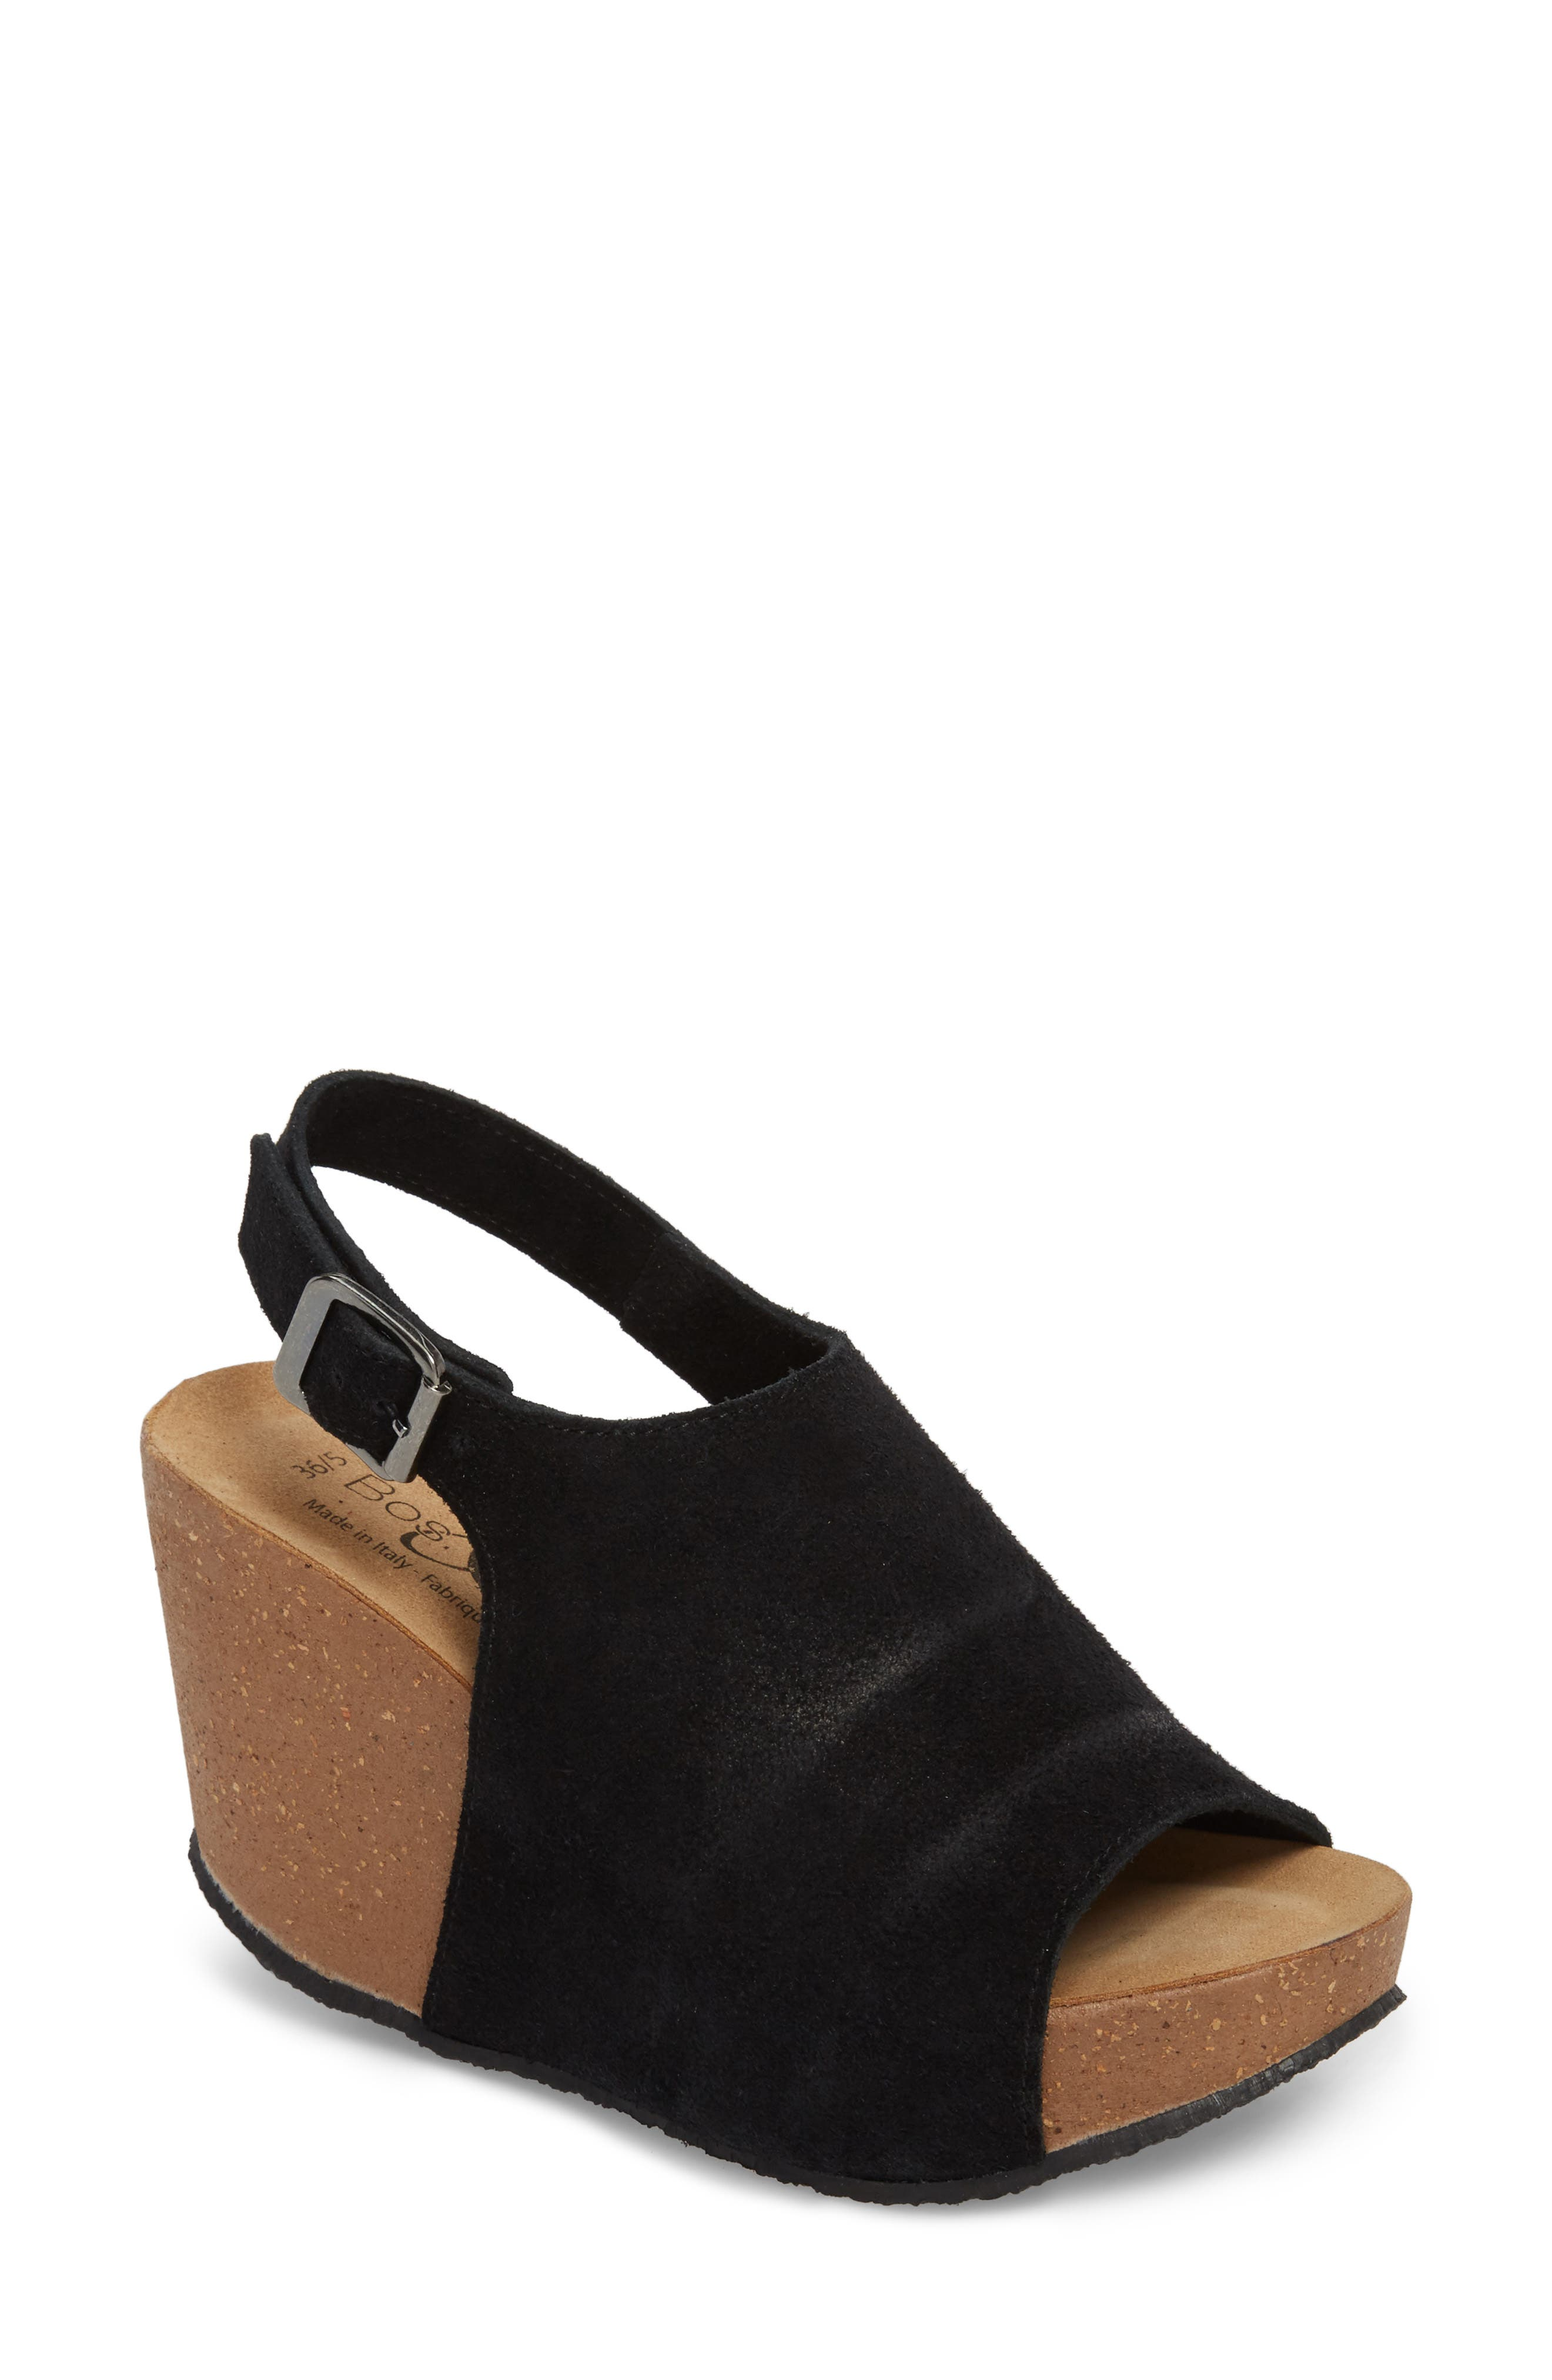 Sheila Platform Wedge Sandal,                         Main,                         color, BLACK NUBUCK